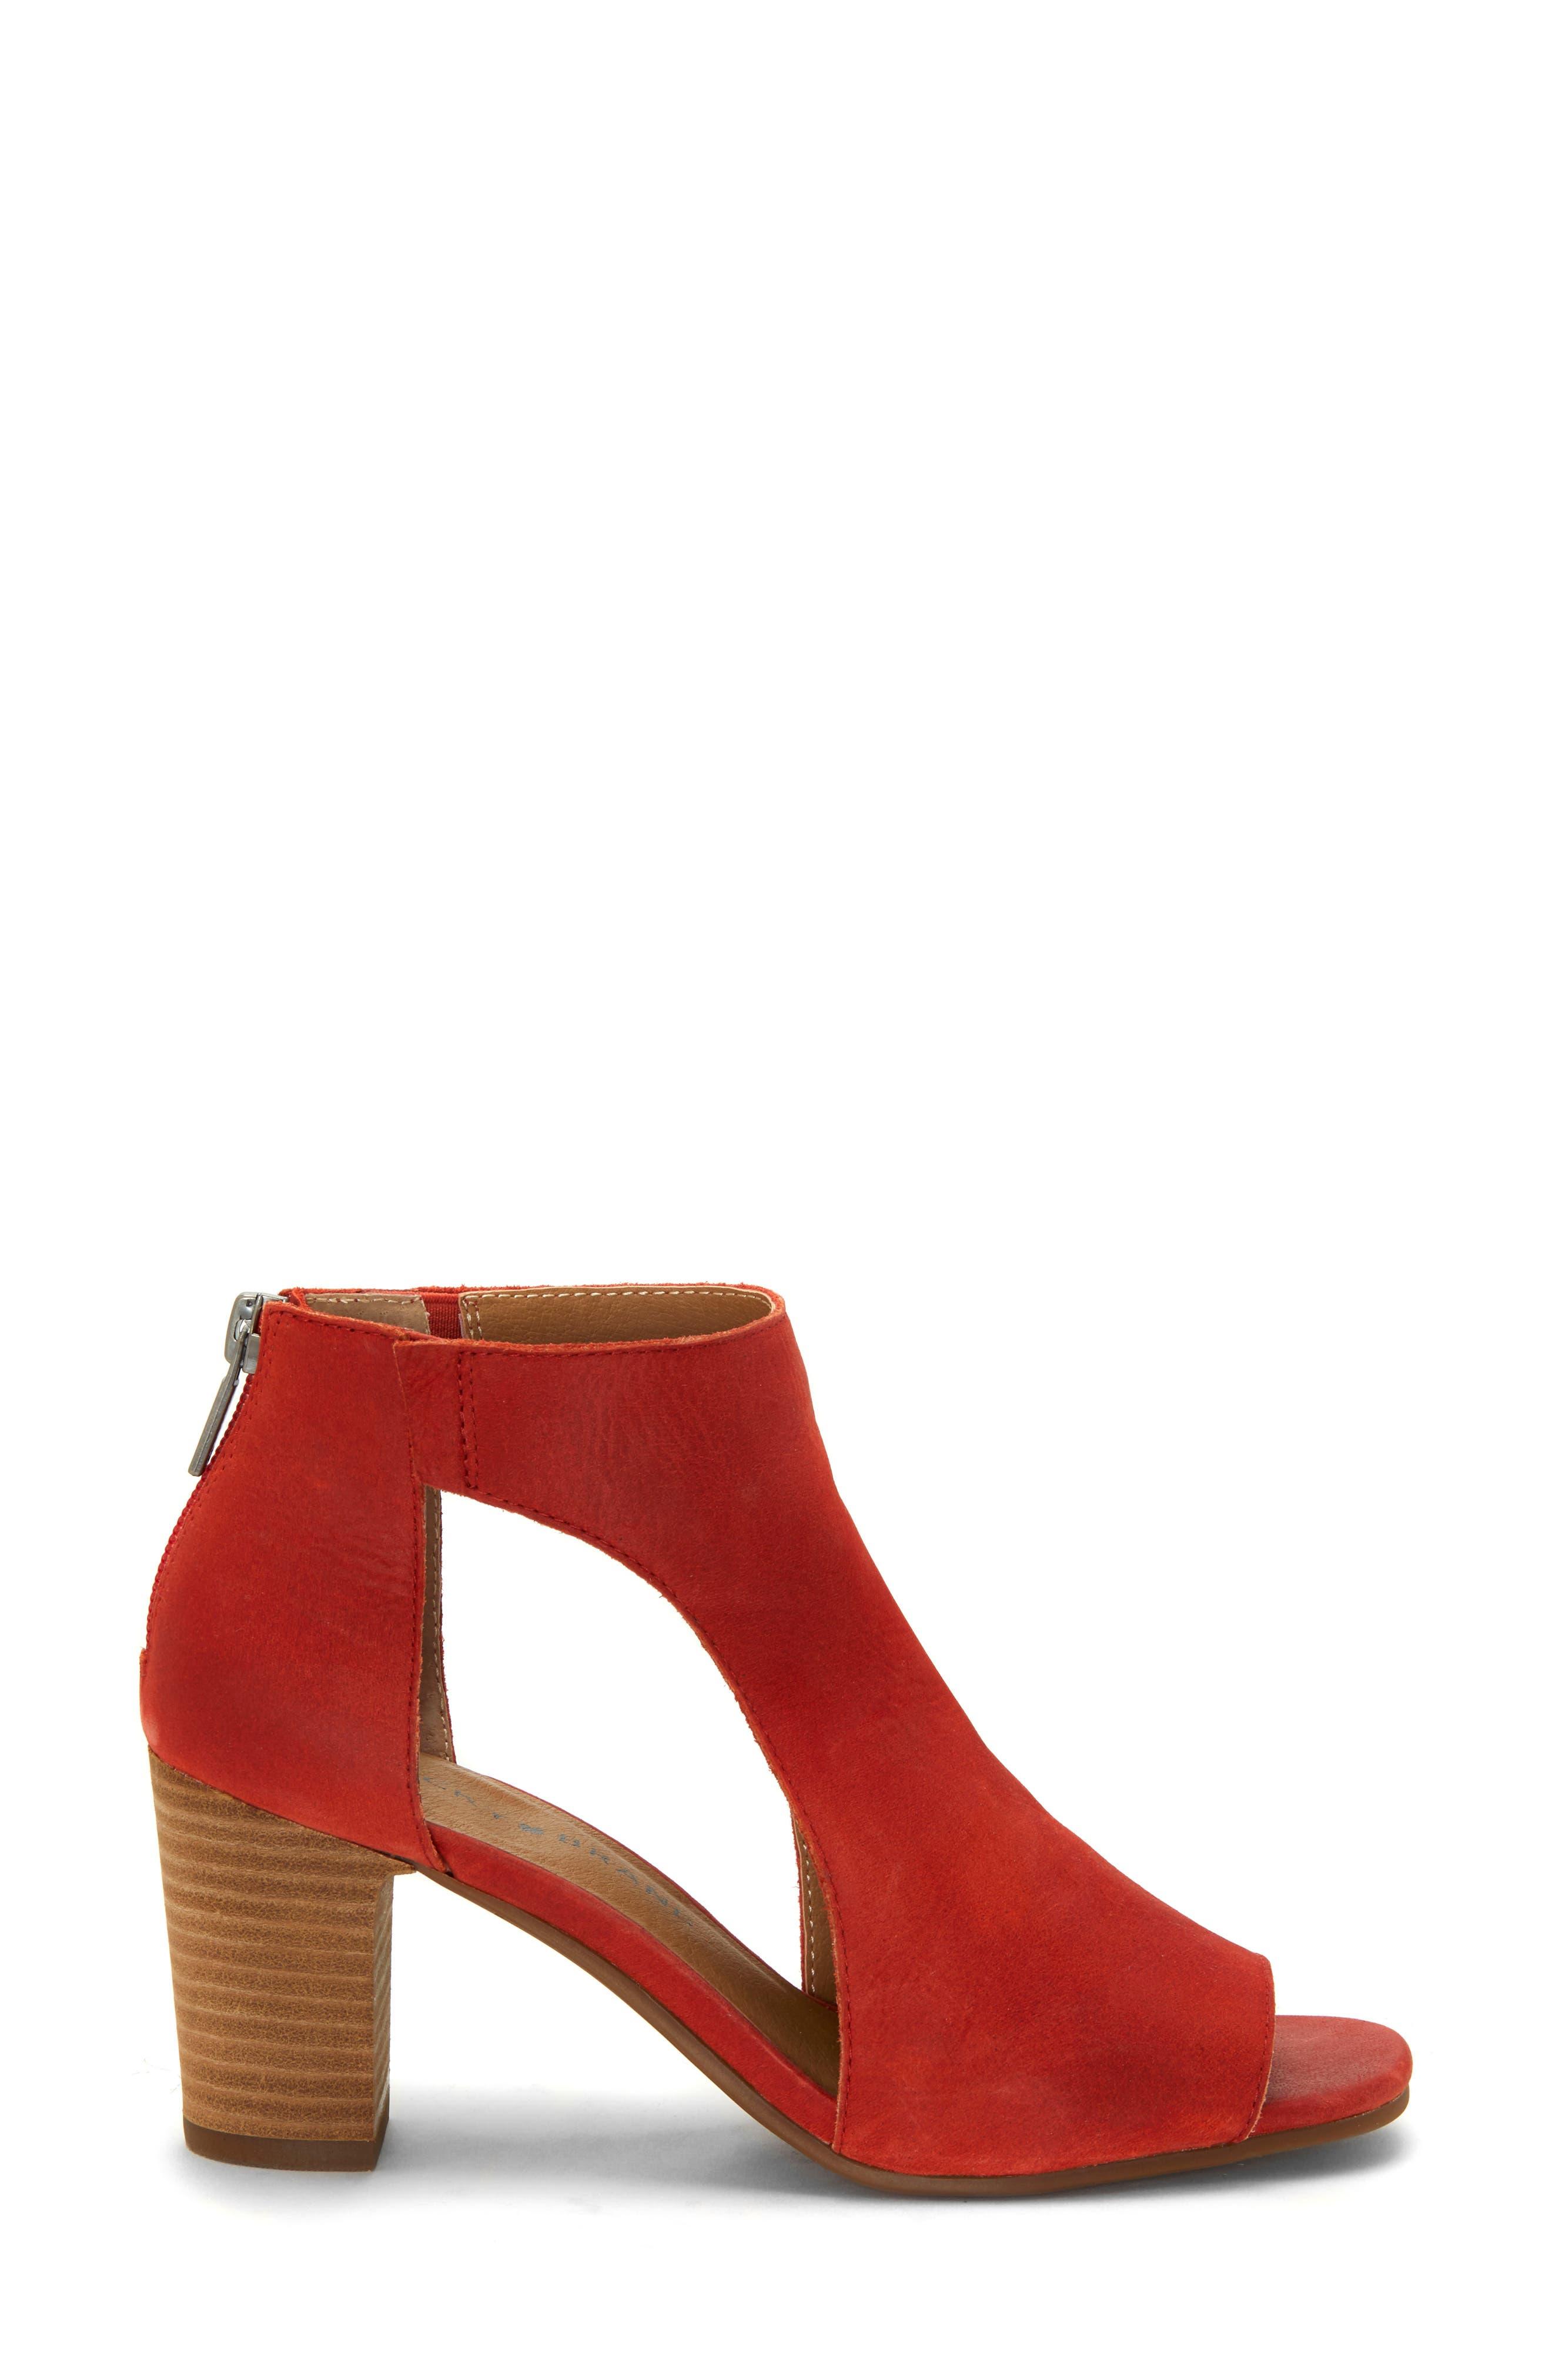 Udine Shield Sandal,                             Alternate thumbnail 3, color,                             TANDORI LEATHER